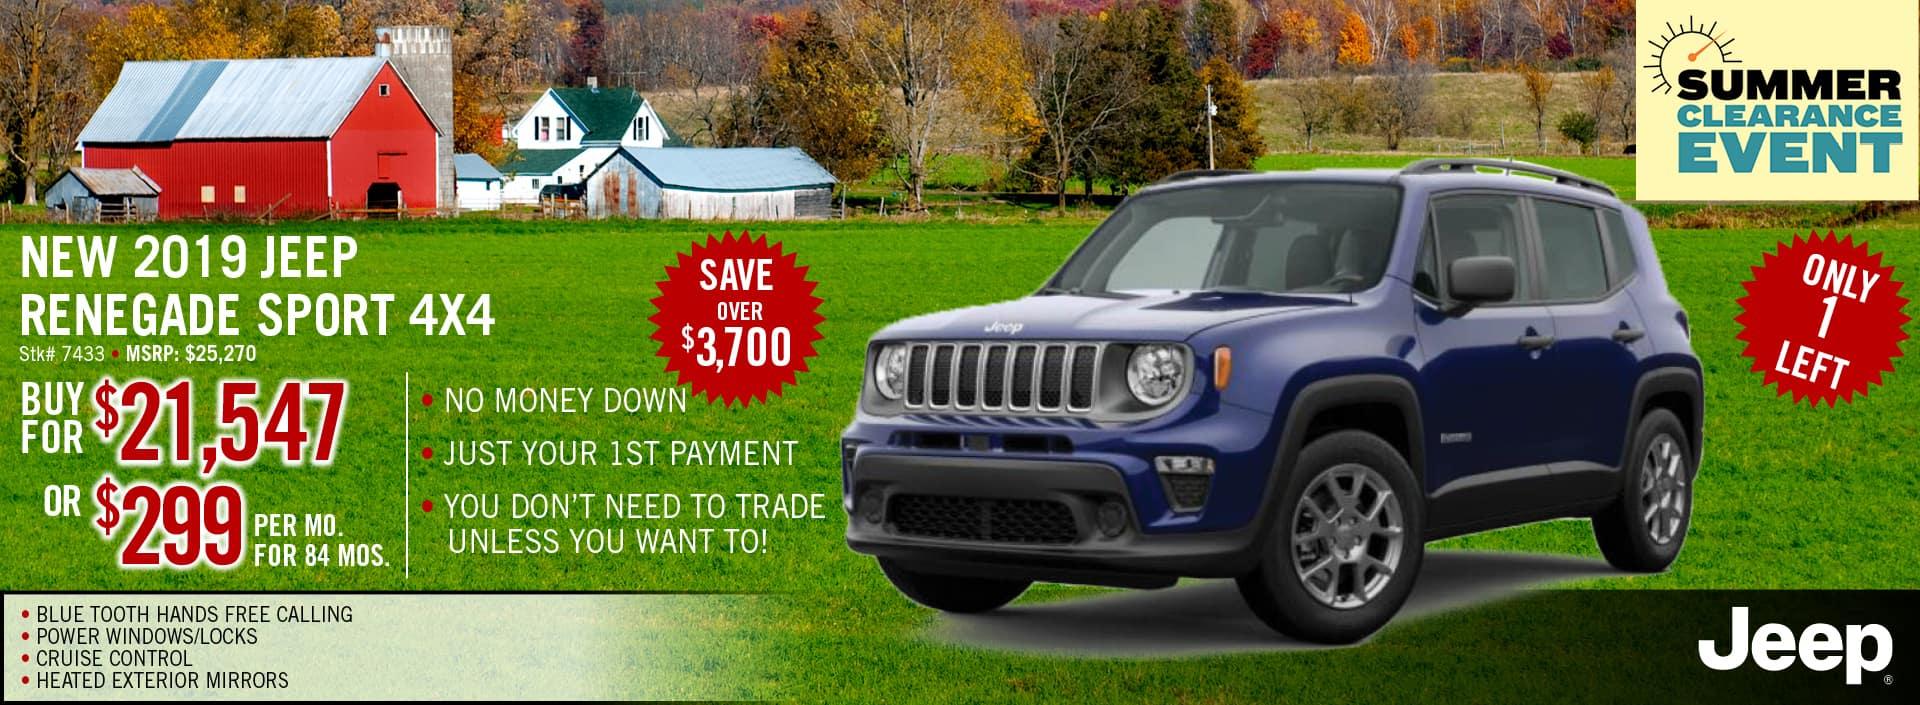 2019 Jeep Renegade Finance Offer | Midstate CDJR